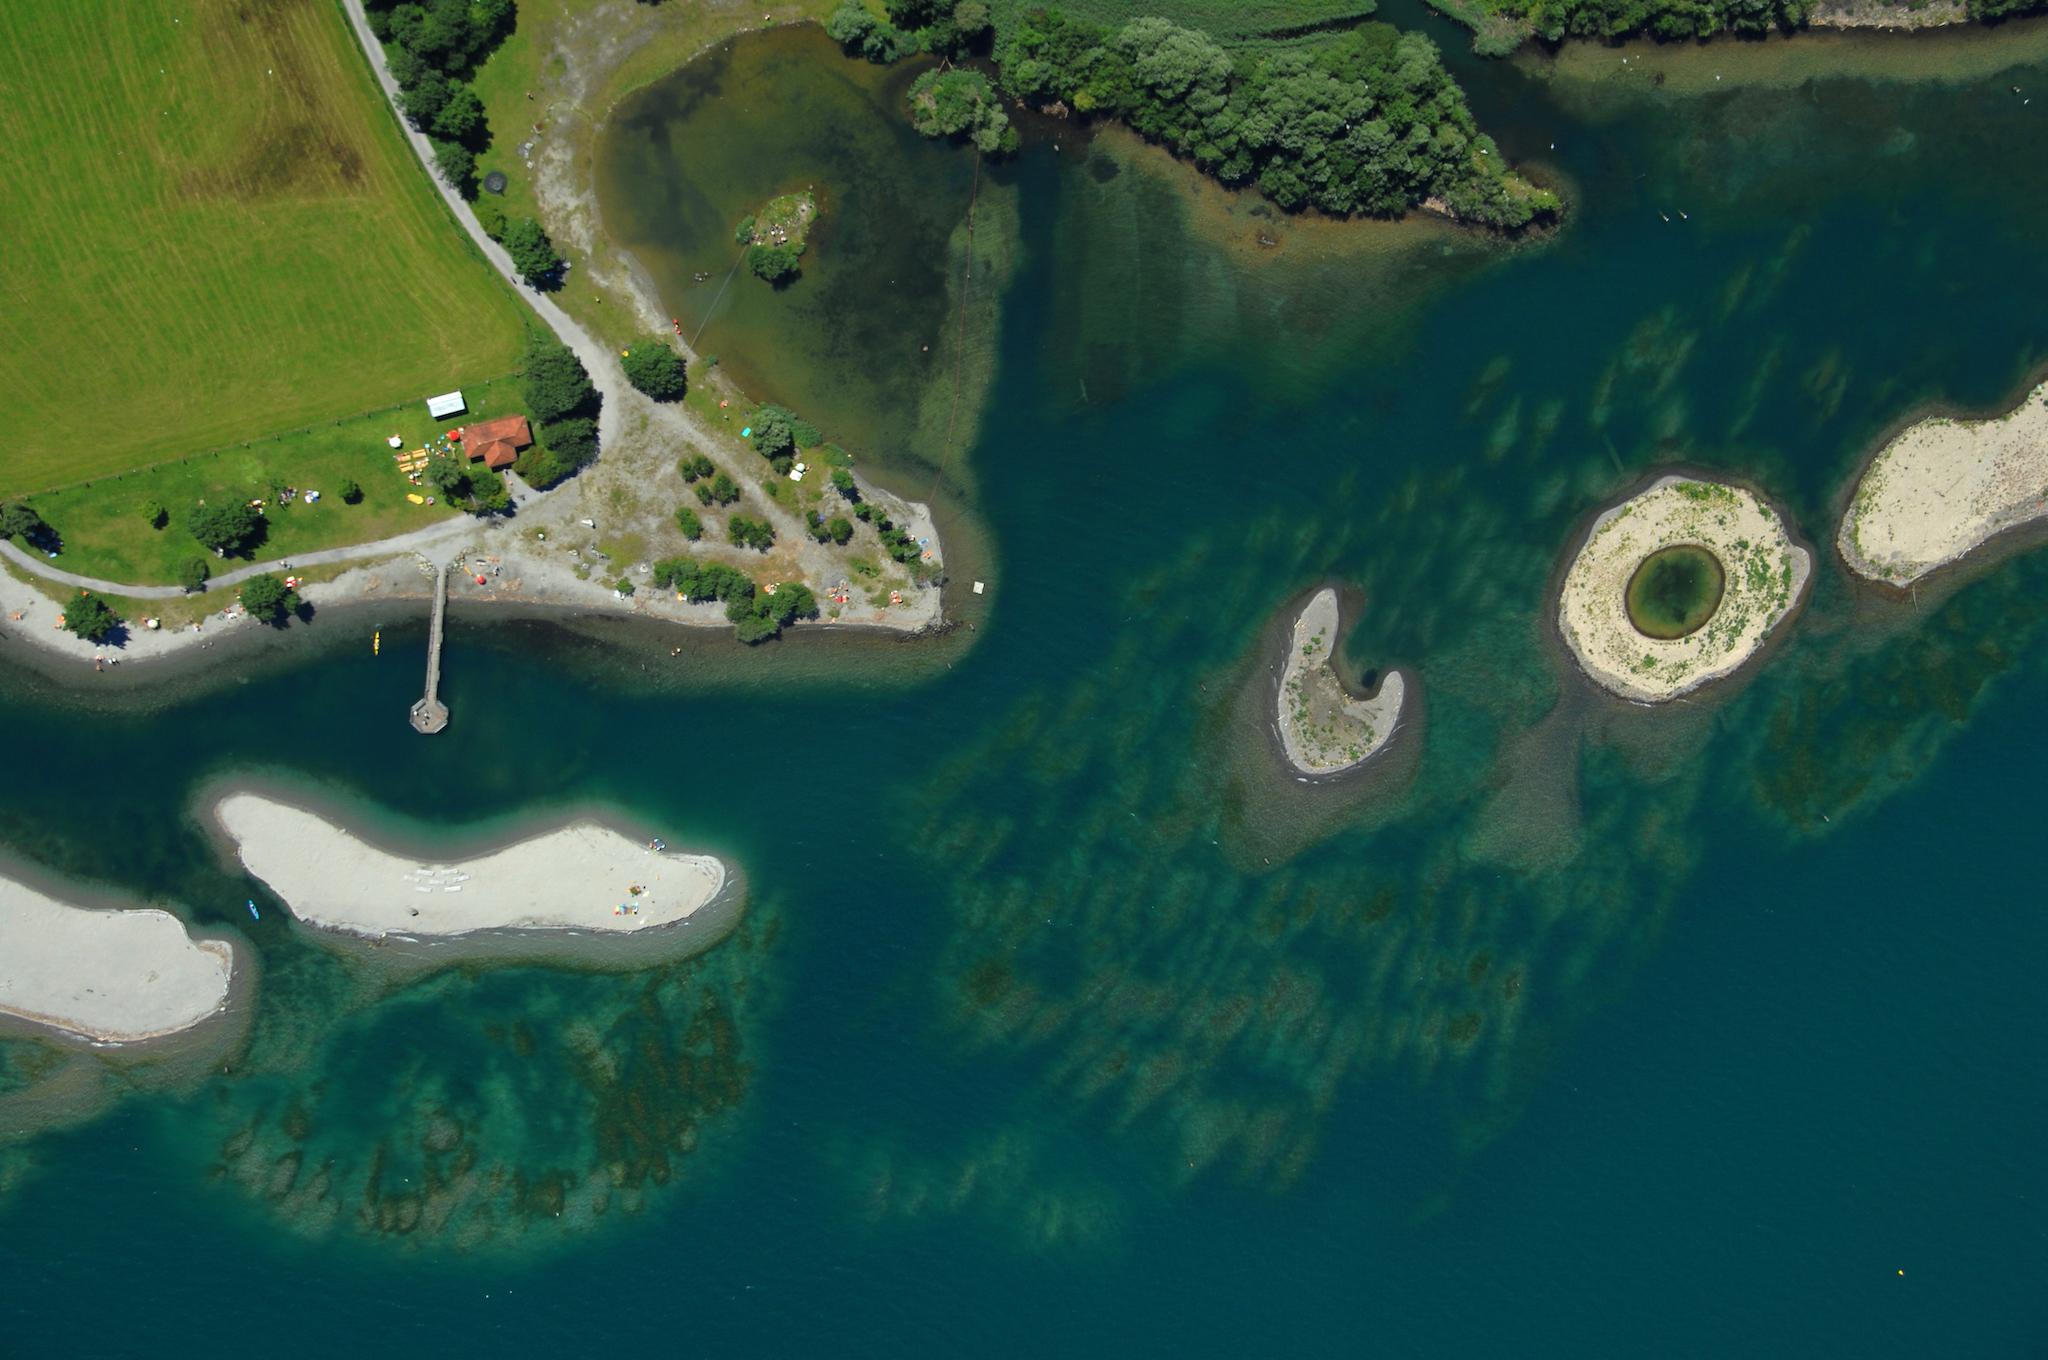 Lorelei Islands, Lucerne-Lake Lucerne Region. For Switzerland Tourism Swiss Islands repost.